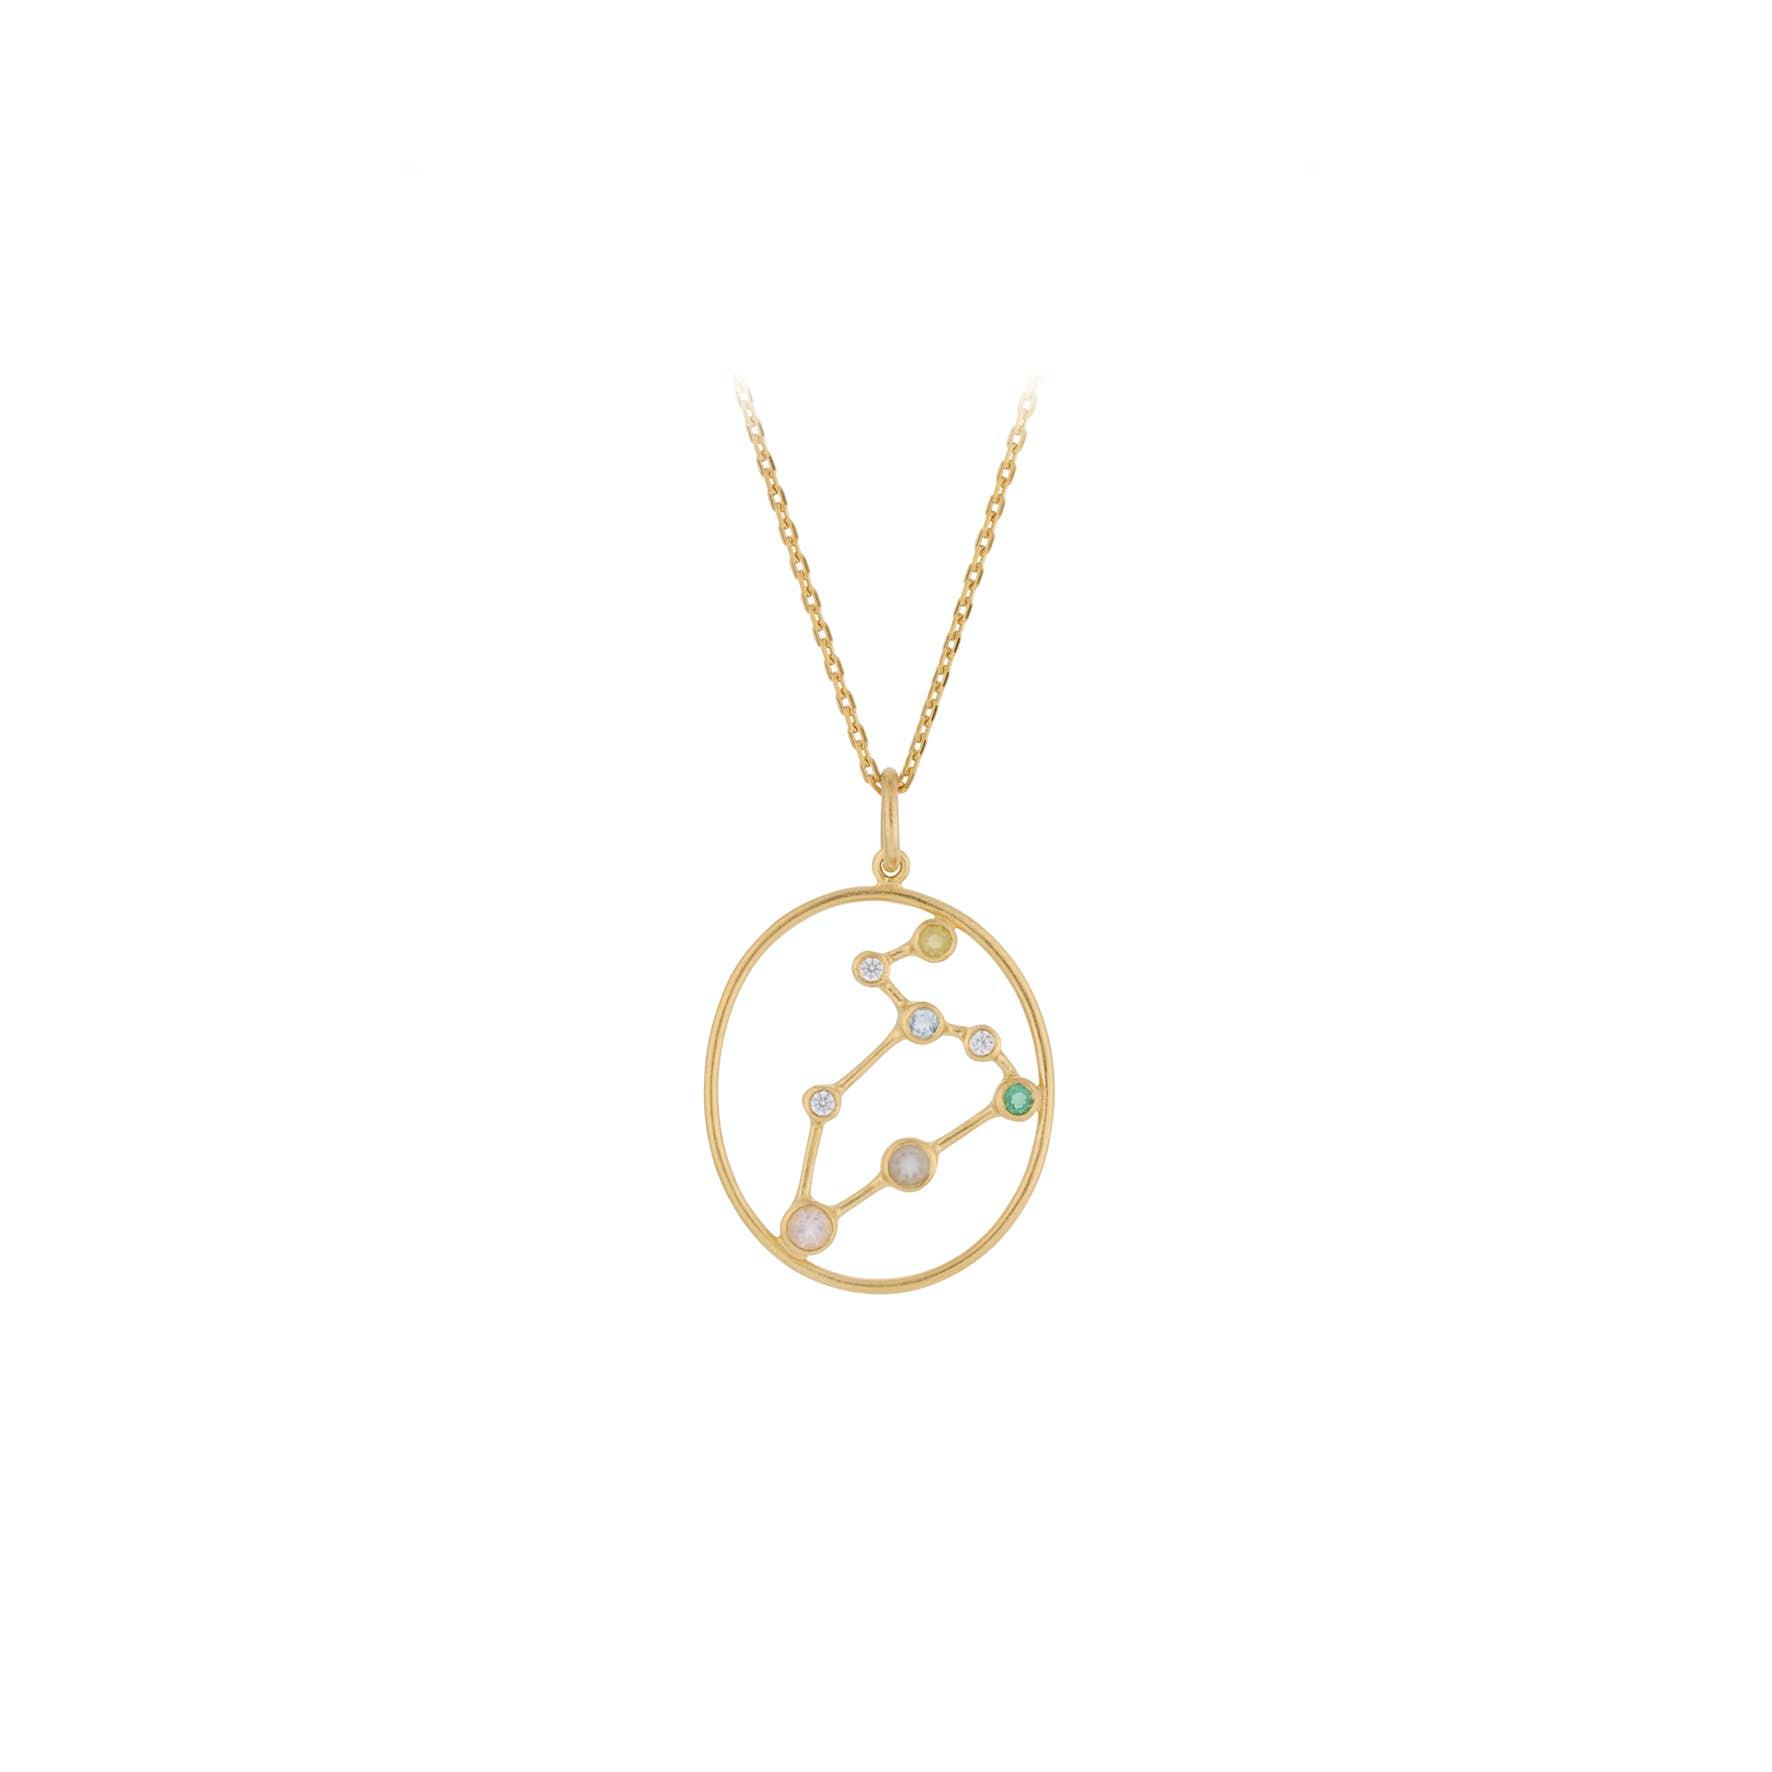 Zodiac Leo Necklace (Jul 23 -  Aug 22) von Pernille Corydon in Vergoldet-Silber Sterling 925